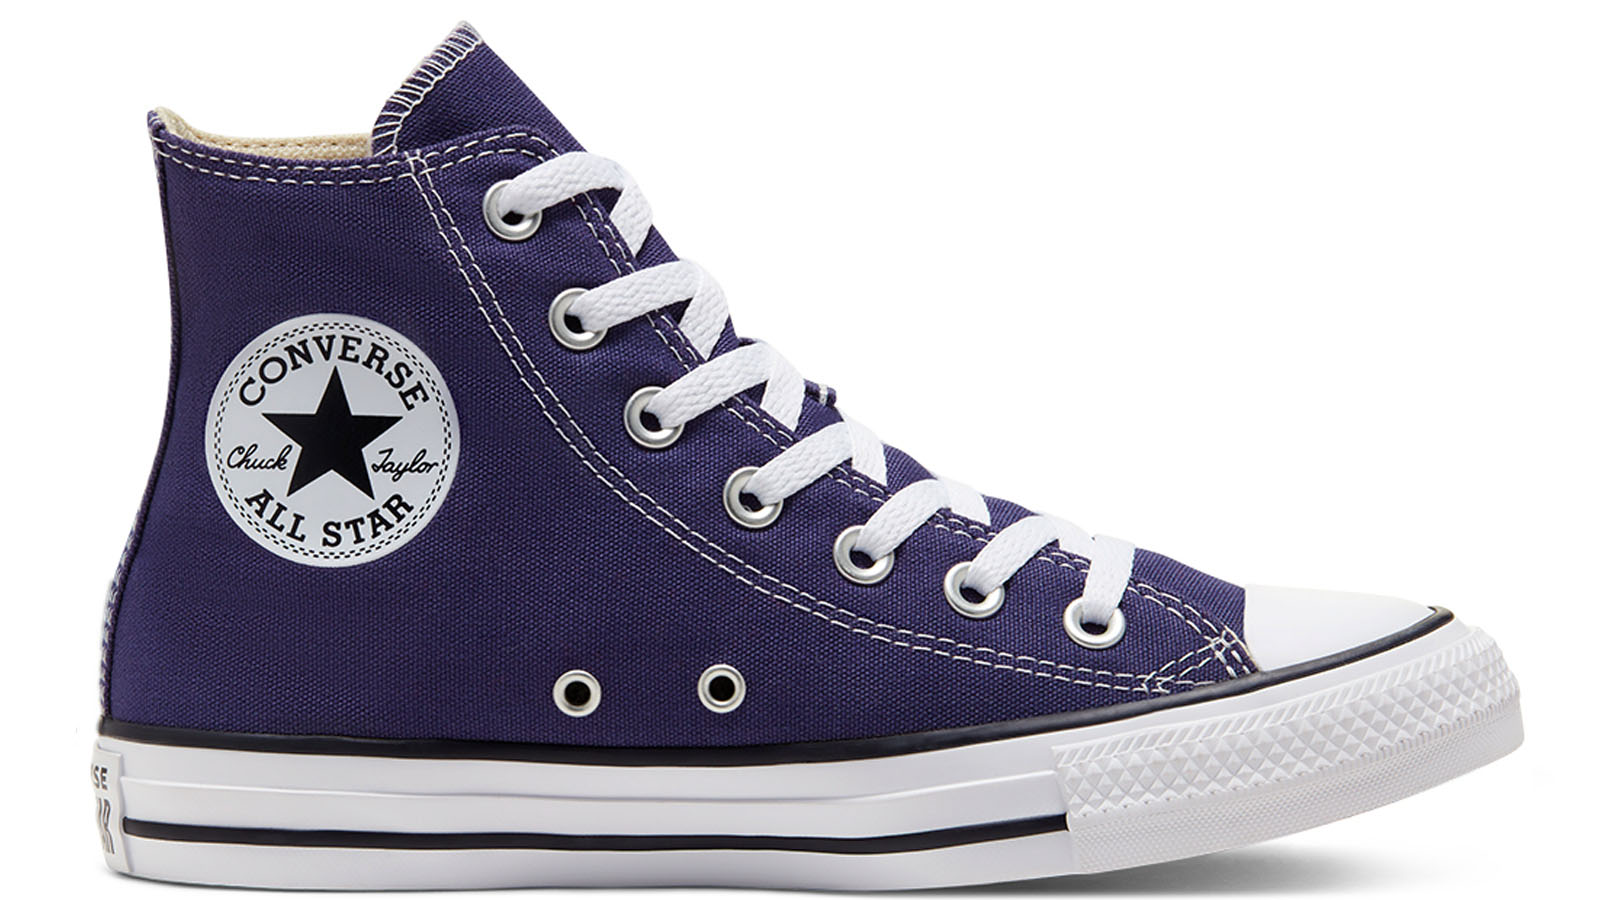 converse high top purple